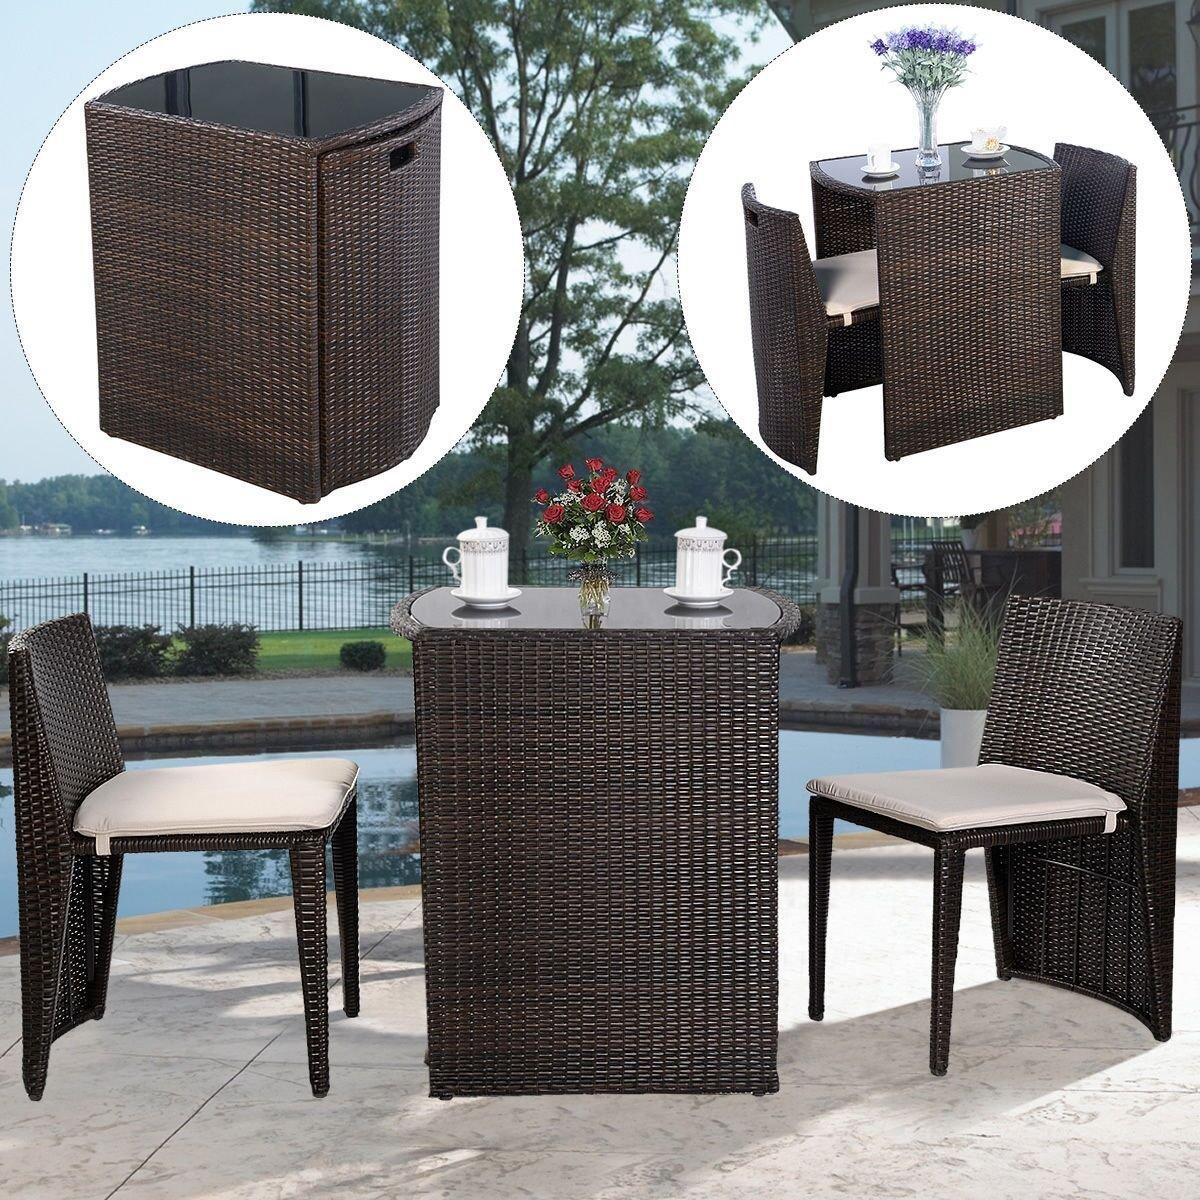 UBRTools 3 PCS Cushioned Outdoor Wicker Patio Set Garden Lawn Sofa Furniture Seat Brown